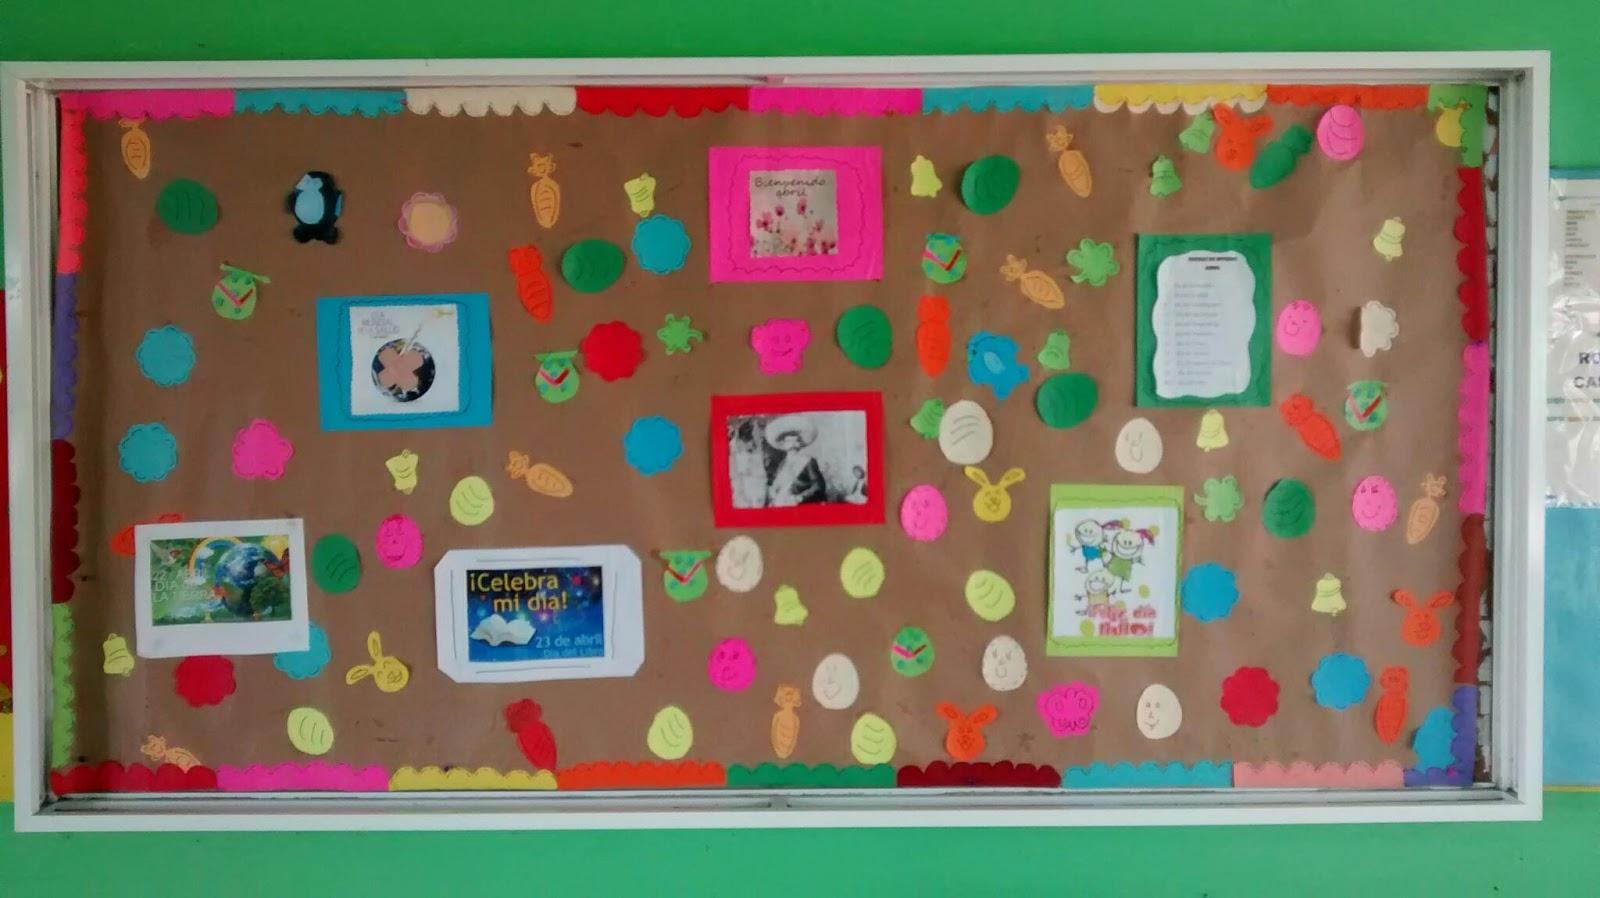 Escuela primaria nicol s bravo nuestro peri dico mural for Cultura para periodico mural